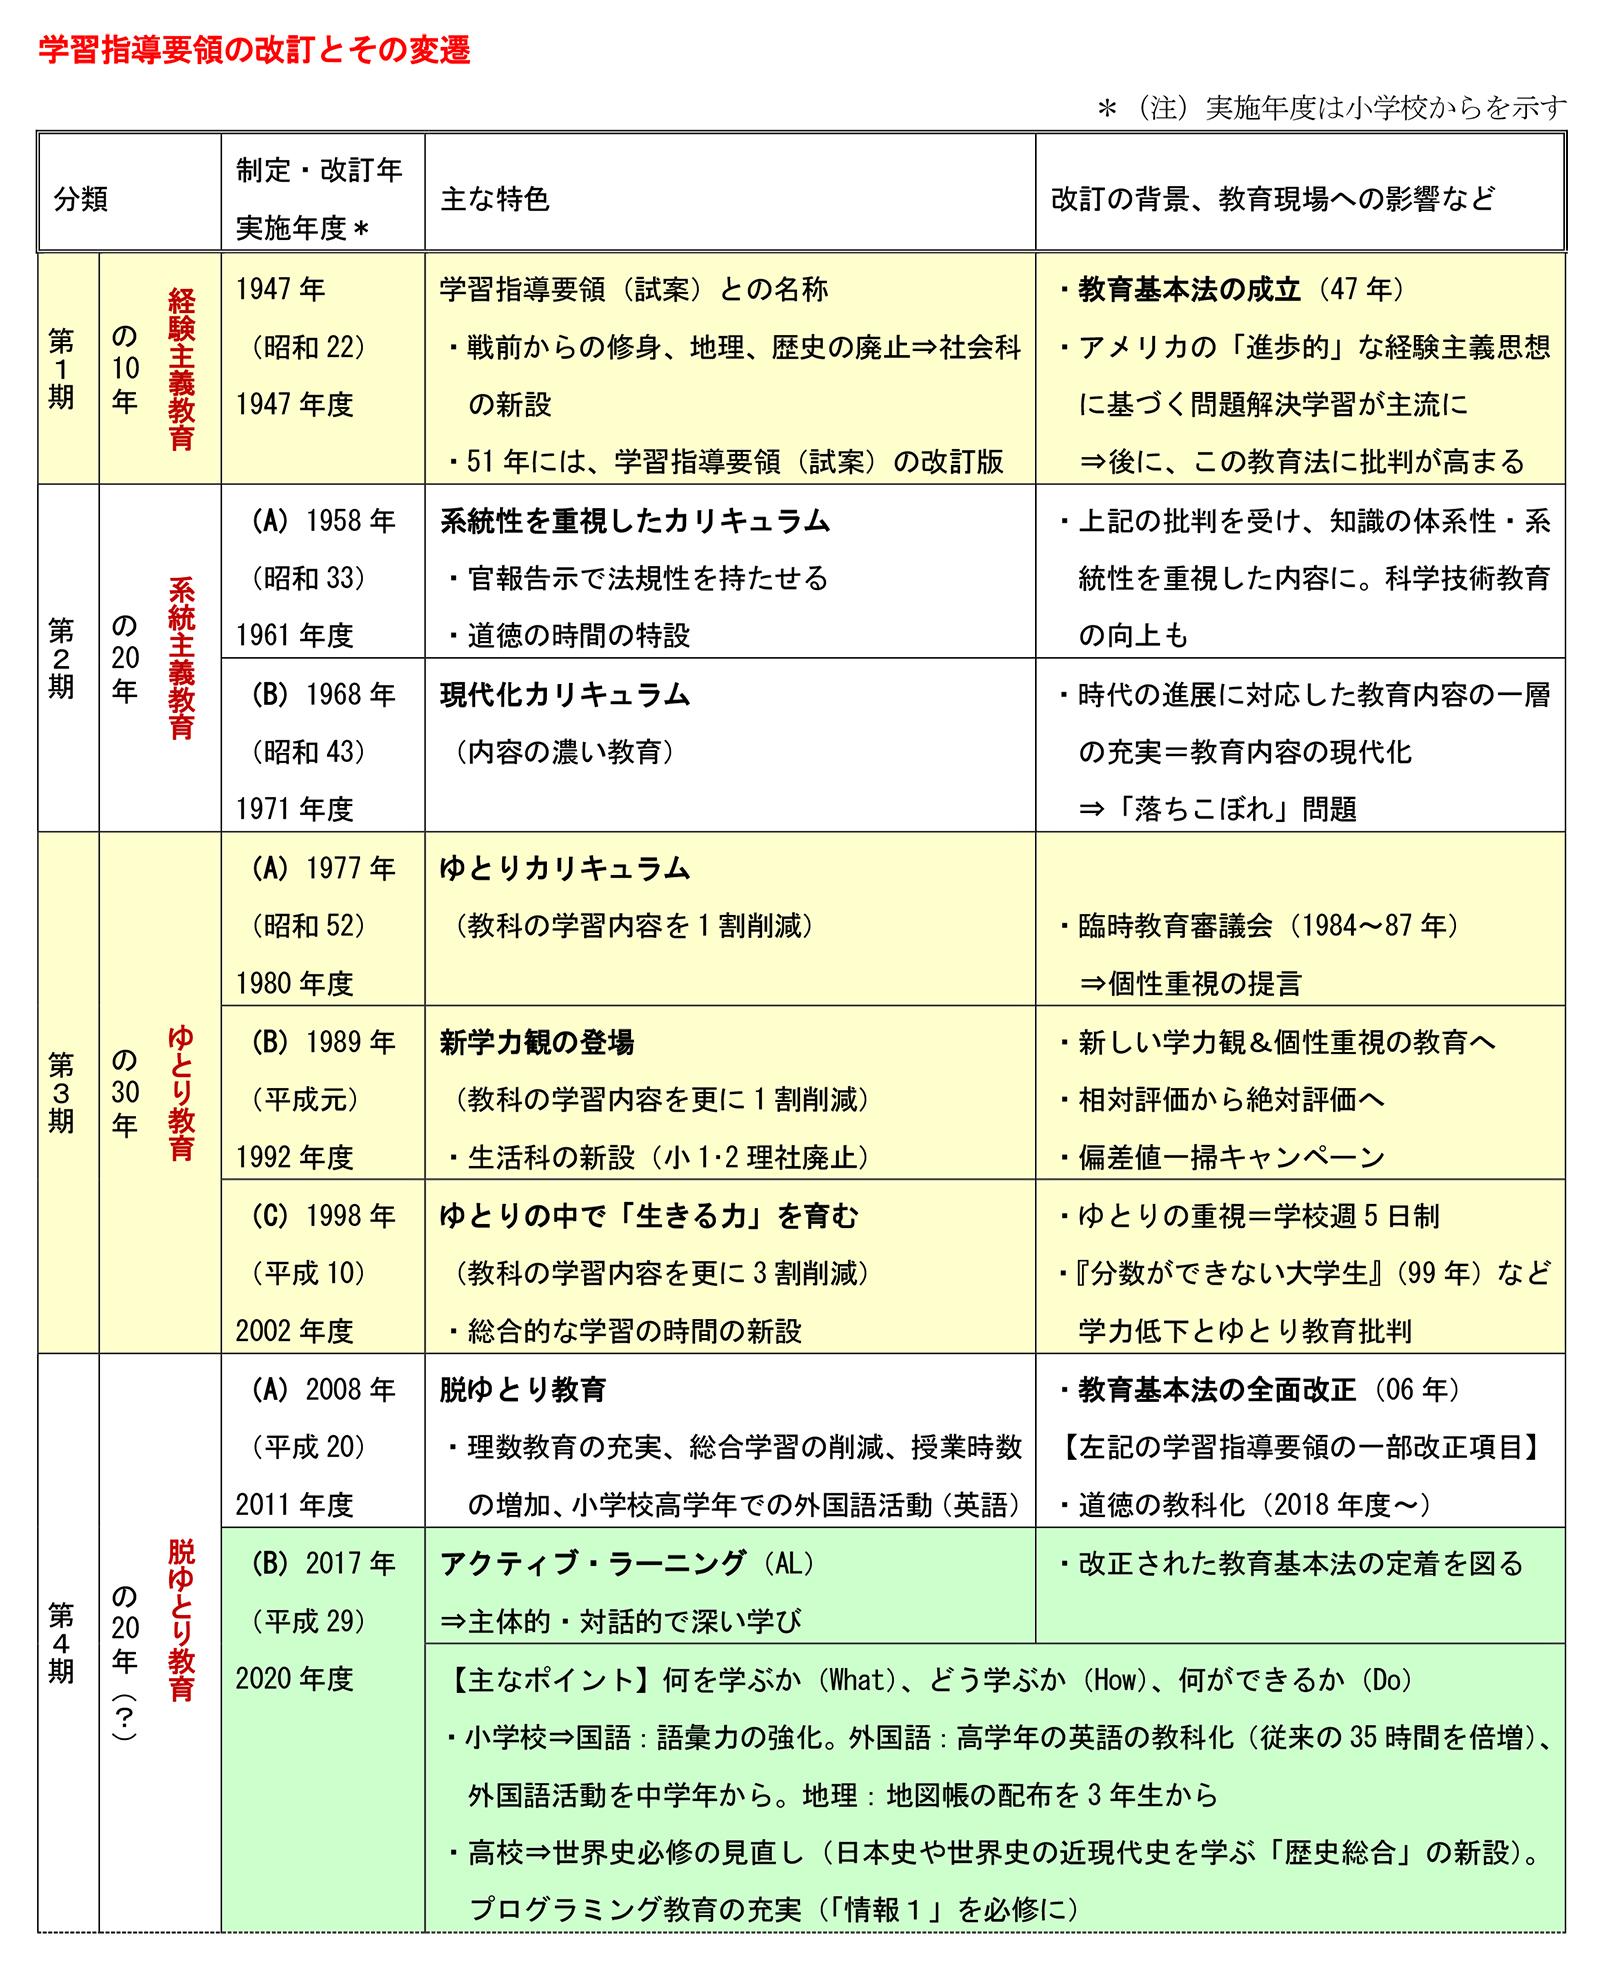 https://nikkan-spa.jp/wp-content/uploads/2016/09/77586bb7d86b8ffa33552c71954b1c8d.jpg